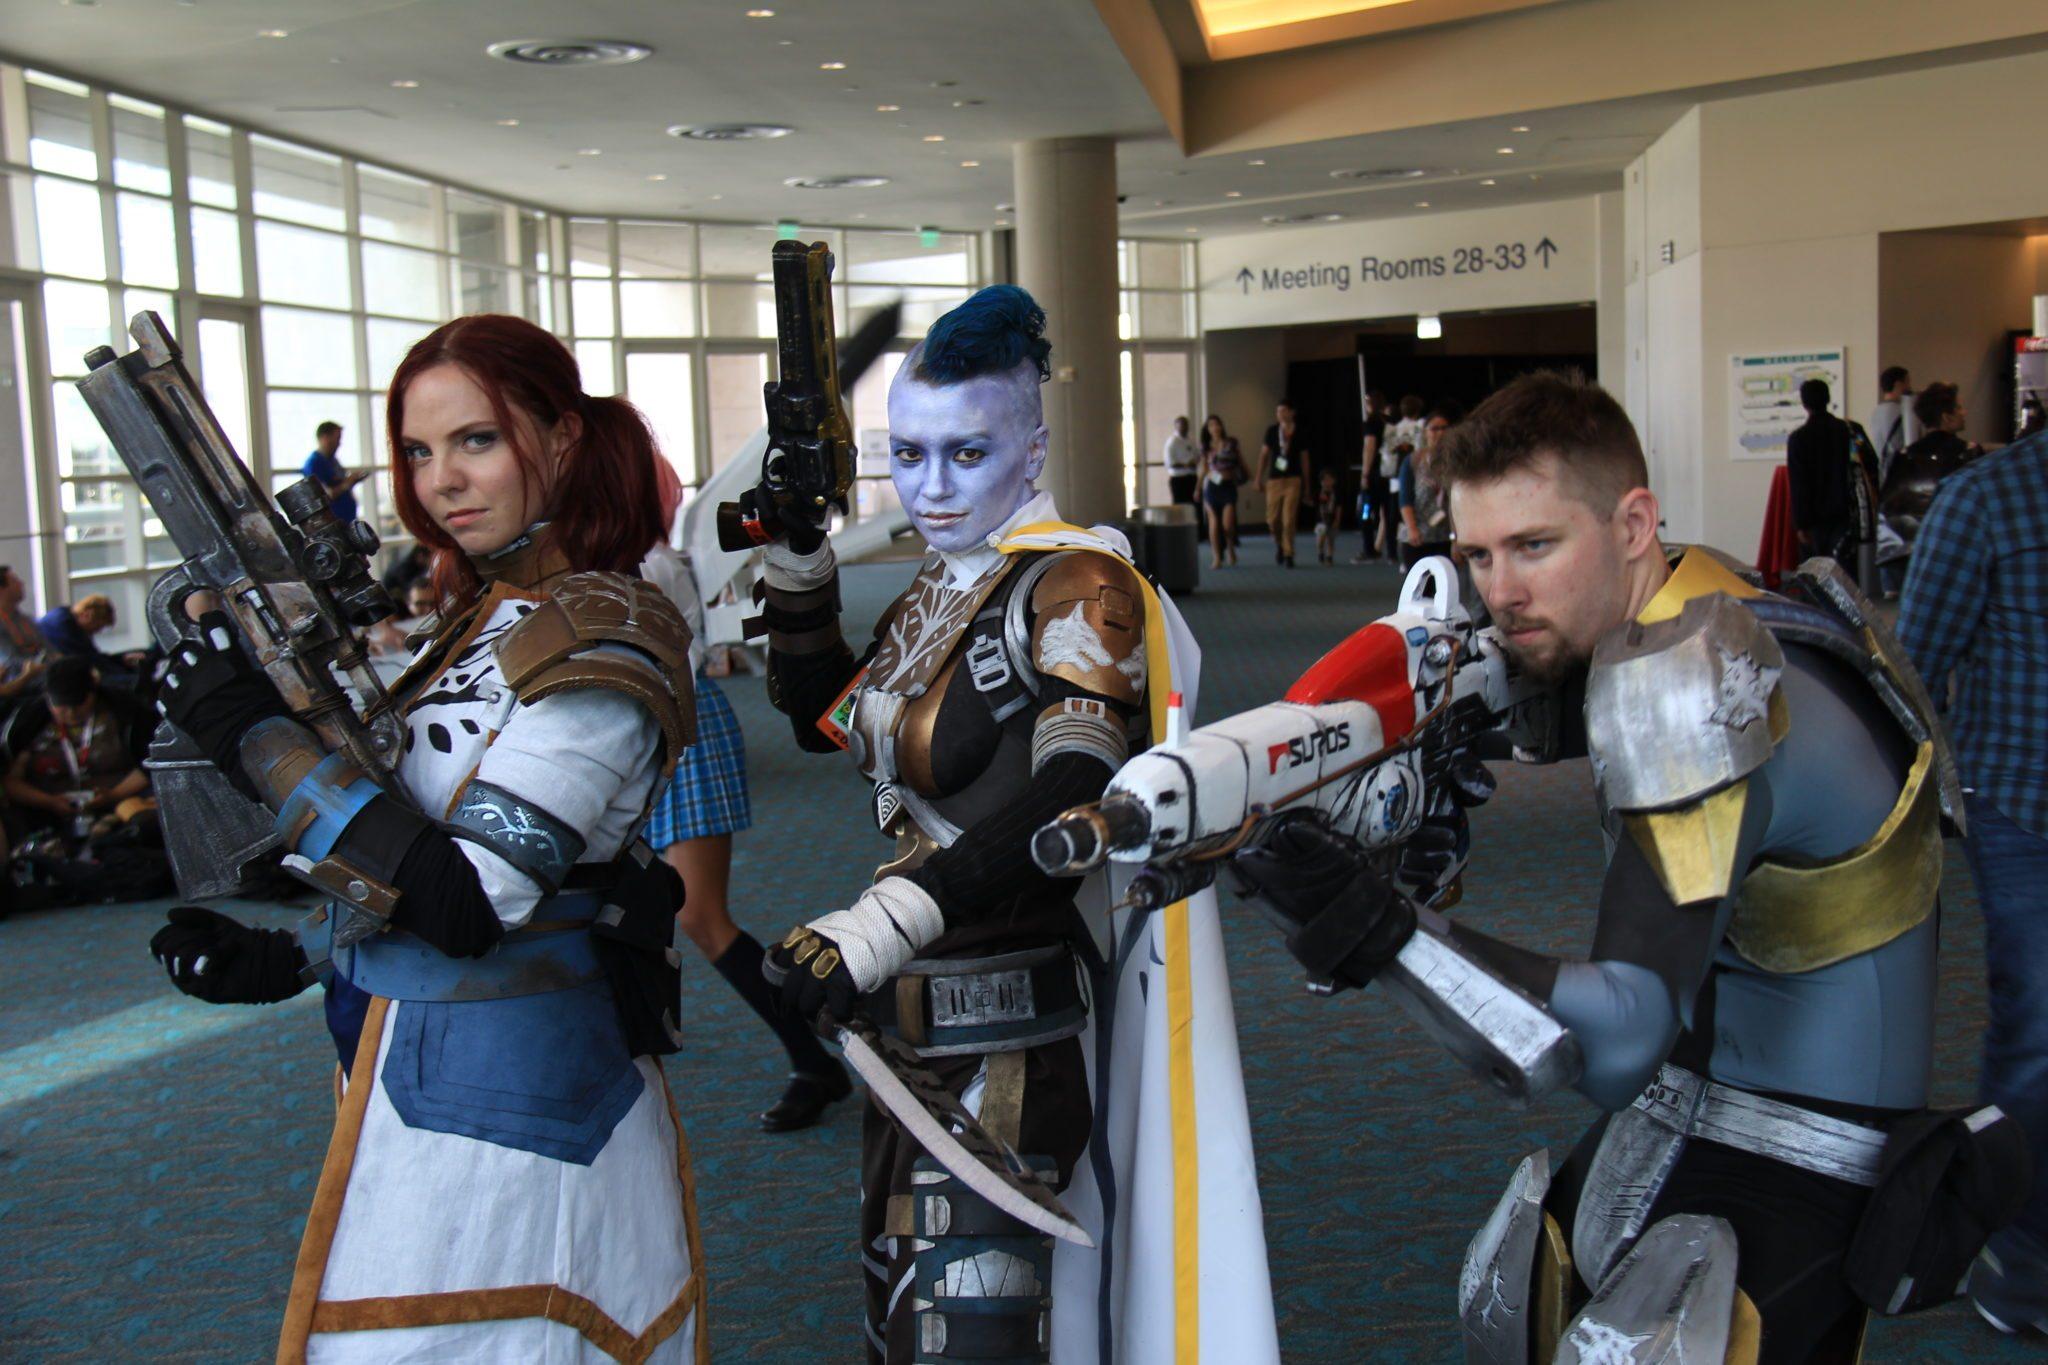 San Diego Comic Con 2015 - Cosplayers 13